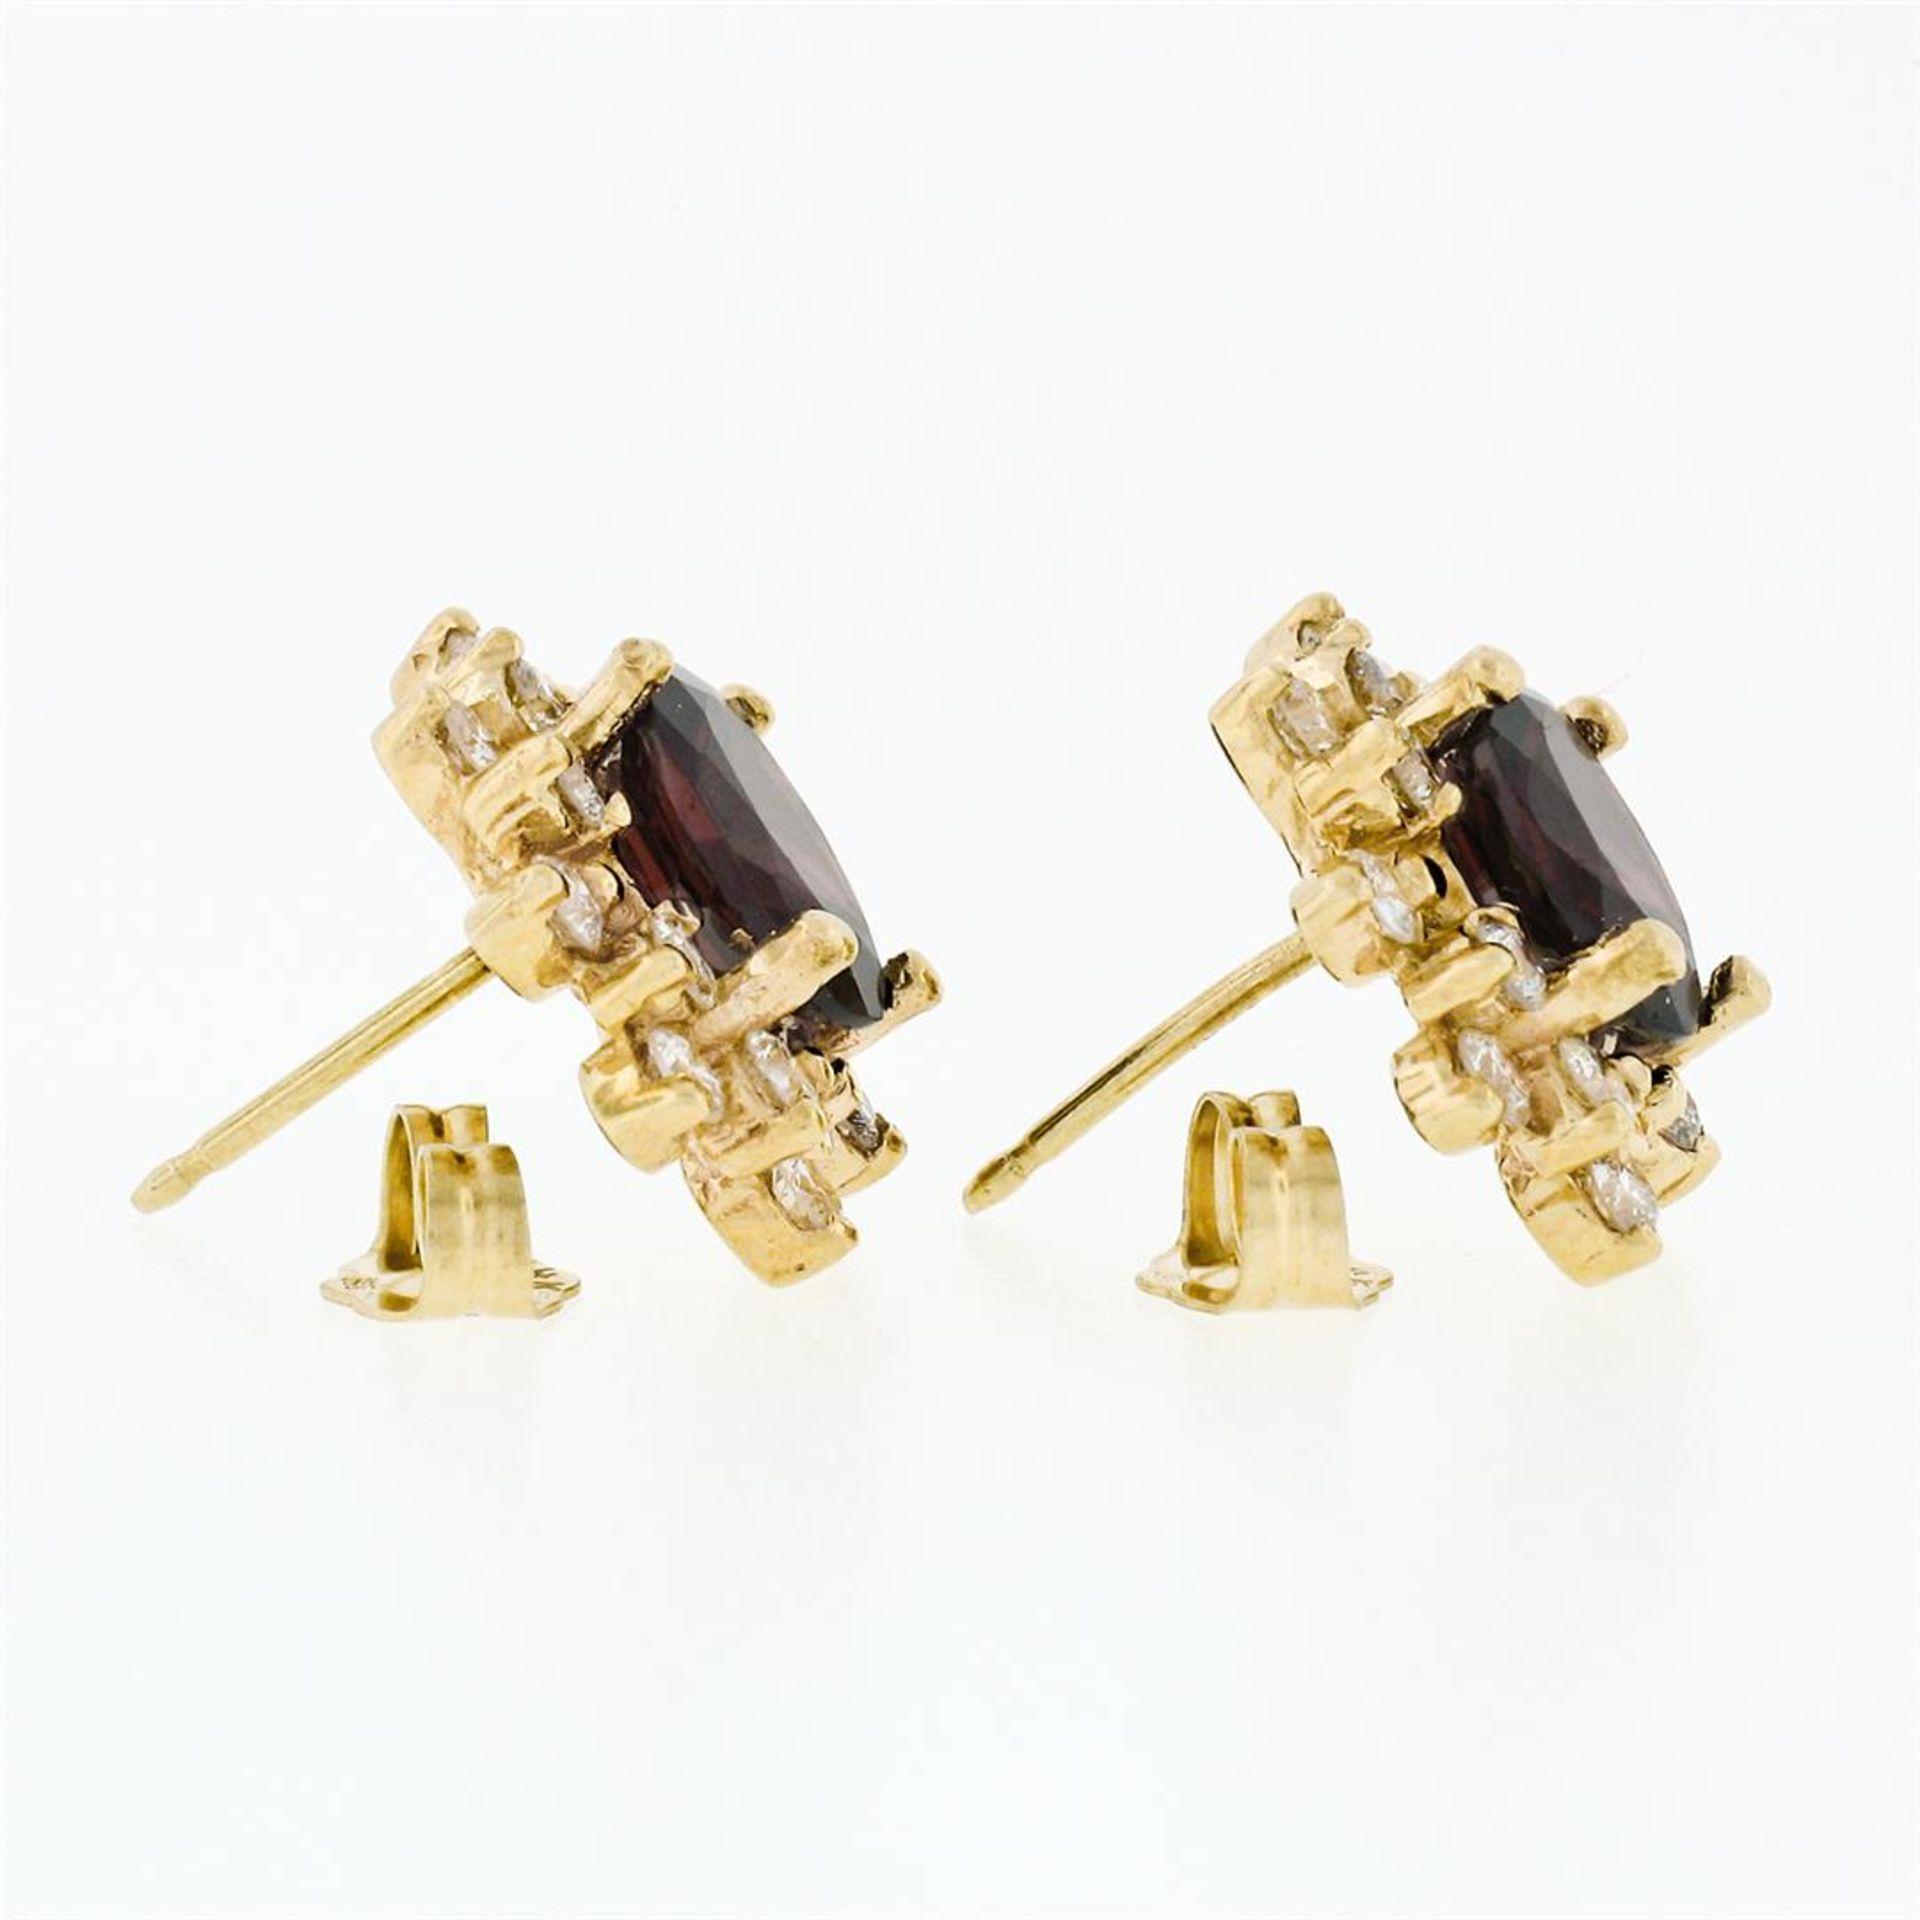 14k Yellow Gold 3.80ctw Oval Garnet & Layered Round Diamond Halo Stud Earrings - Image 4 of 5